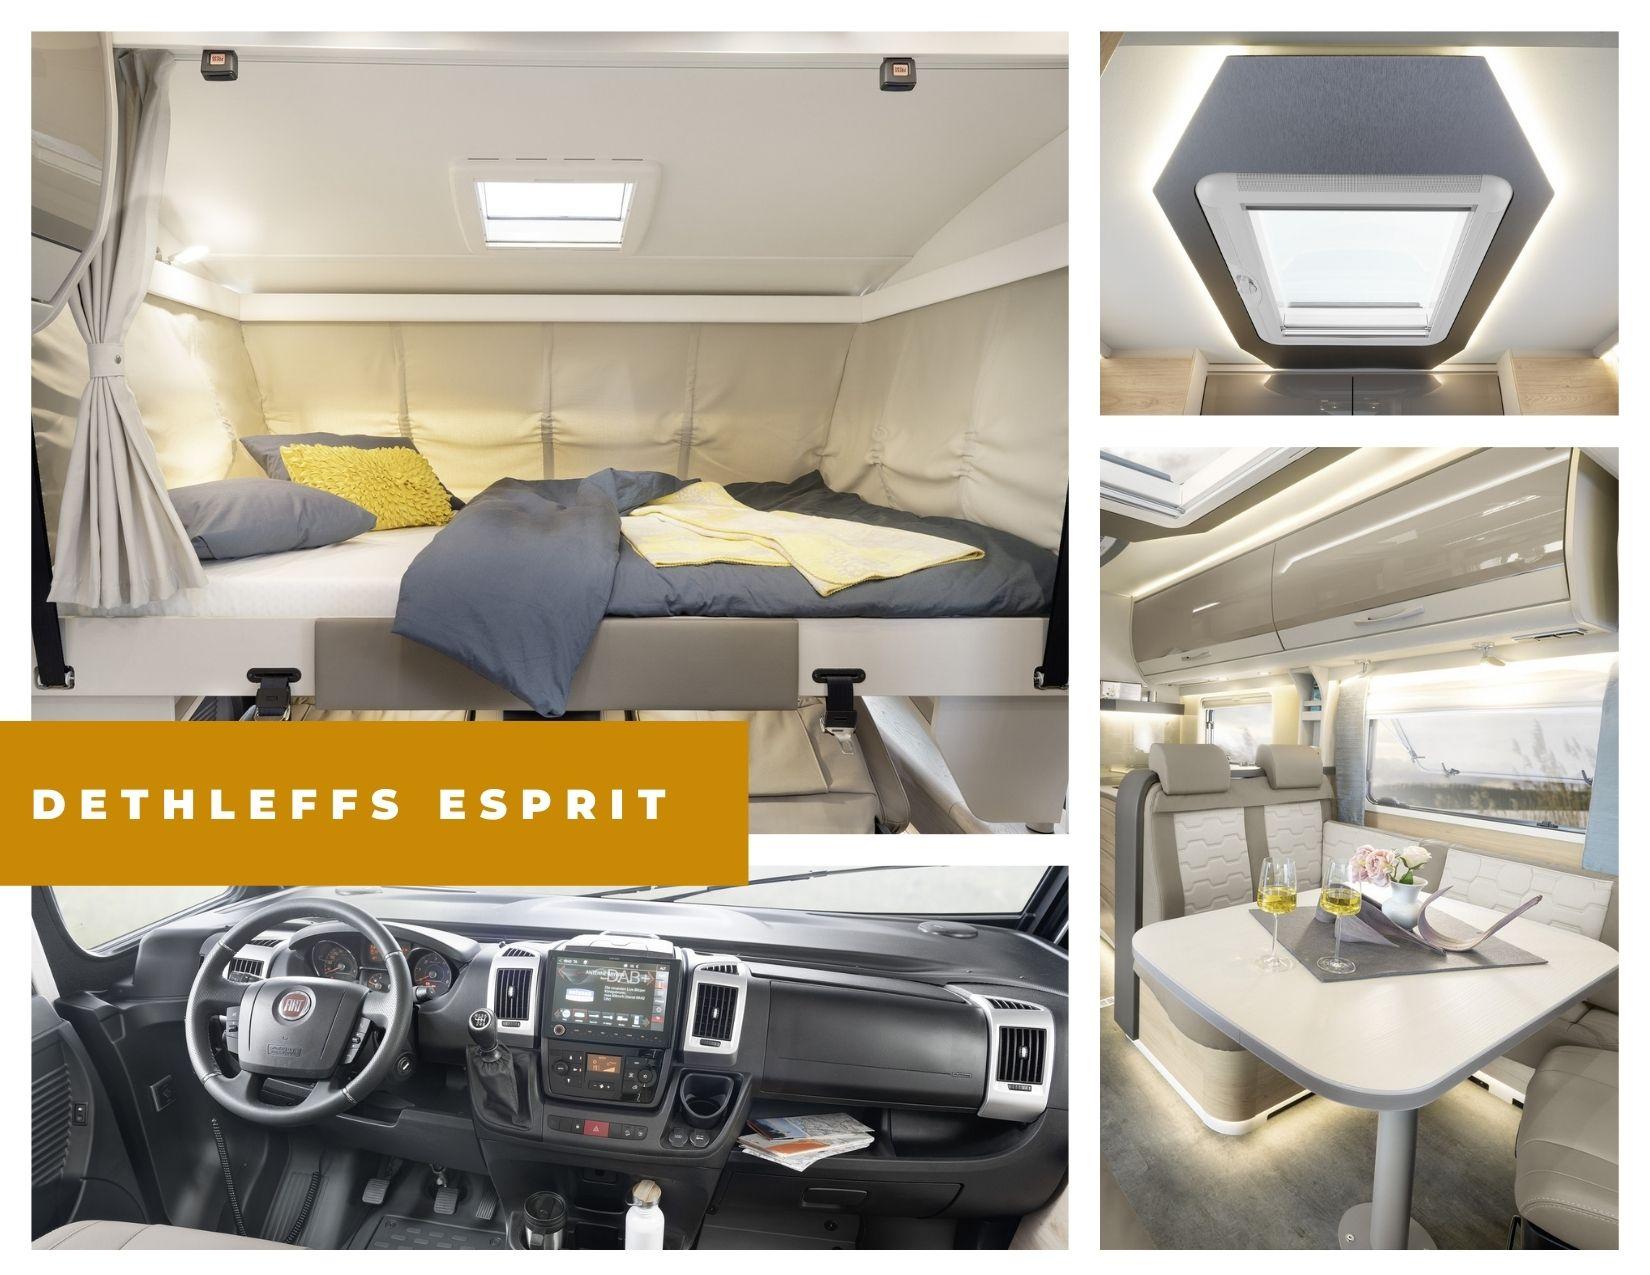 Dethleffs Esprit detalles interior